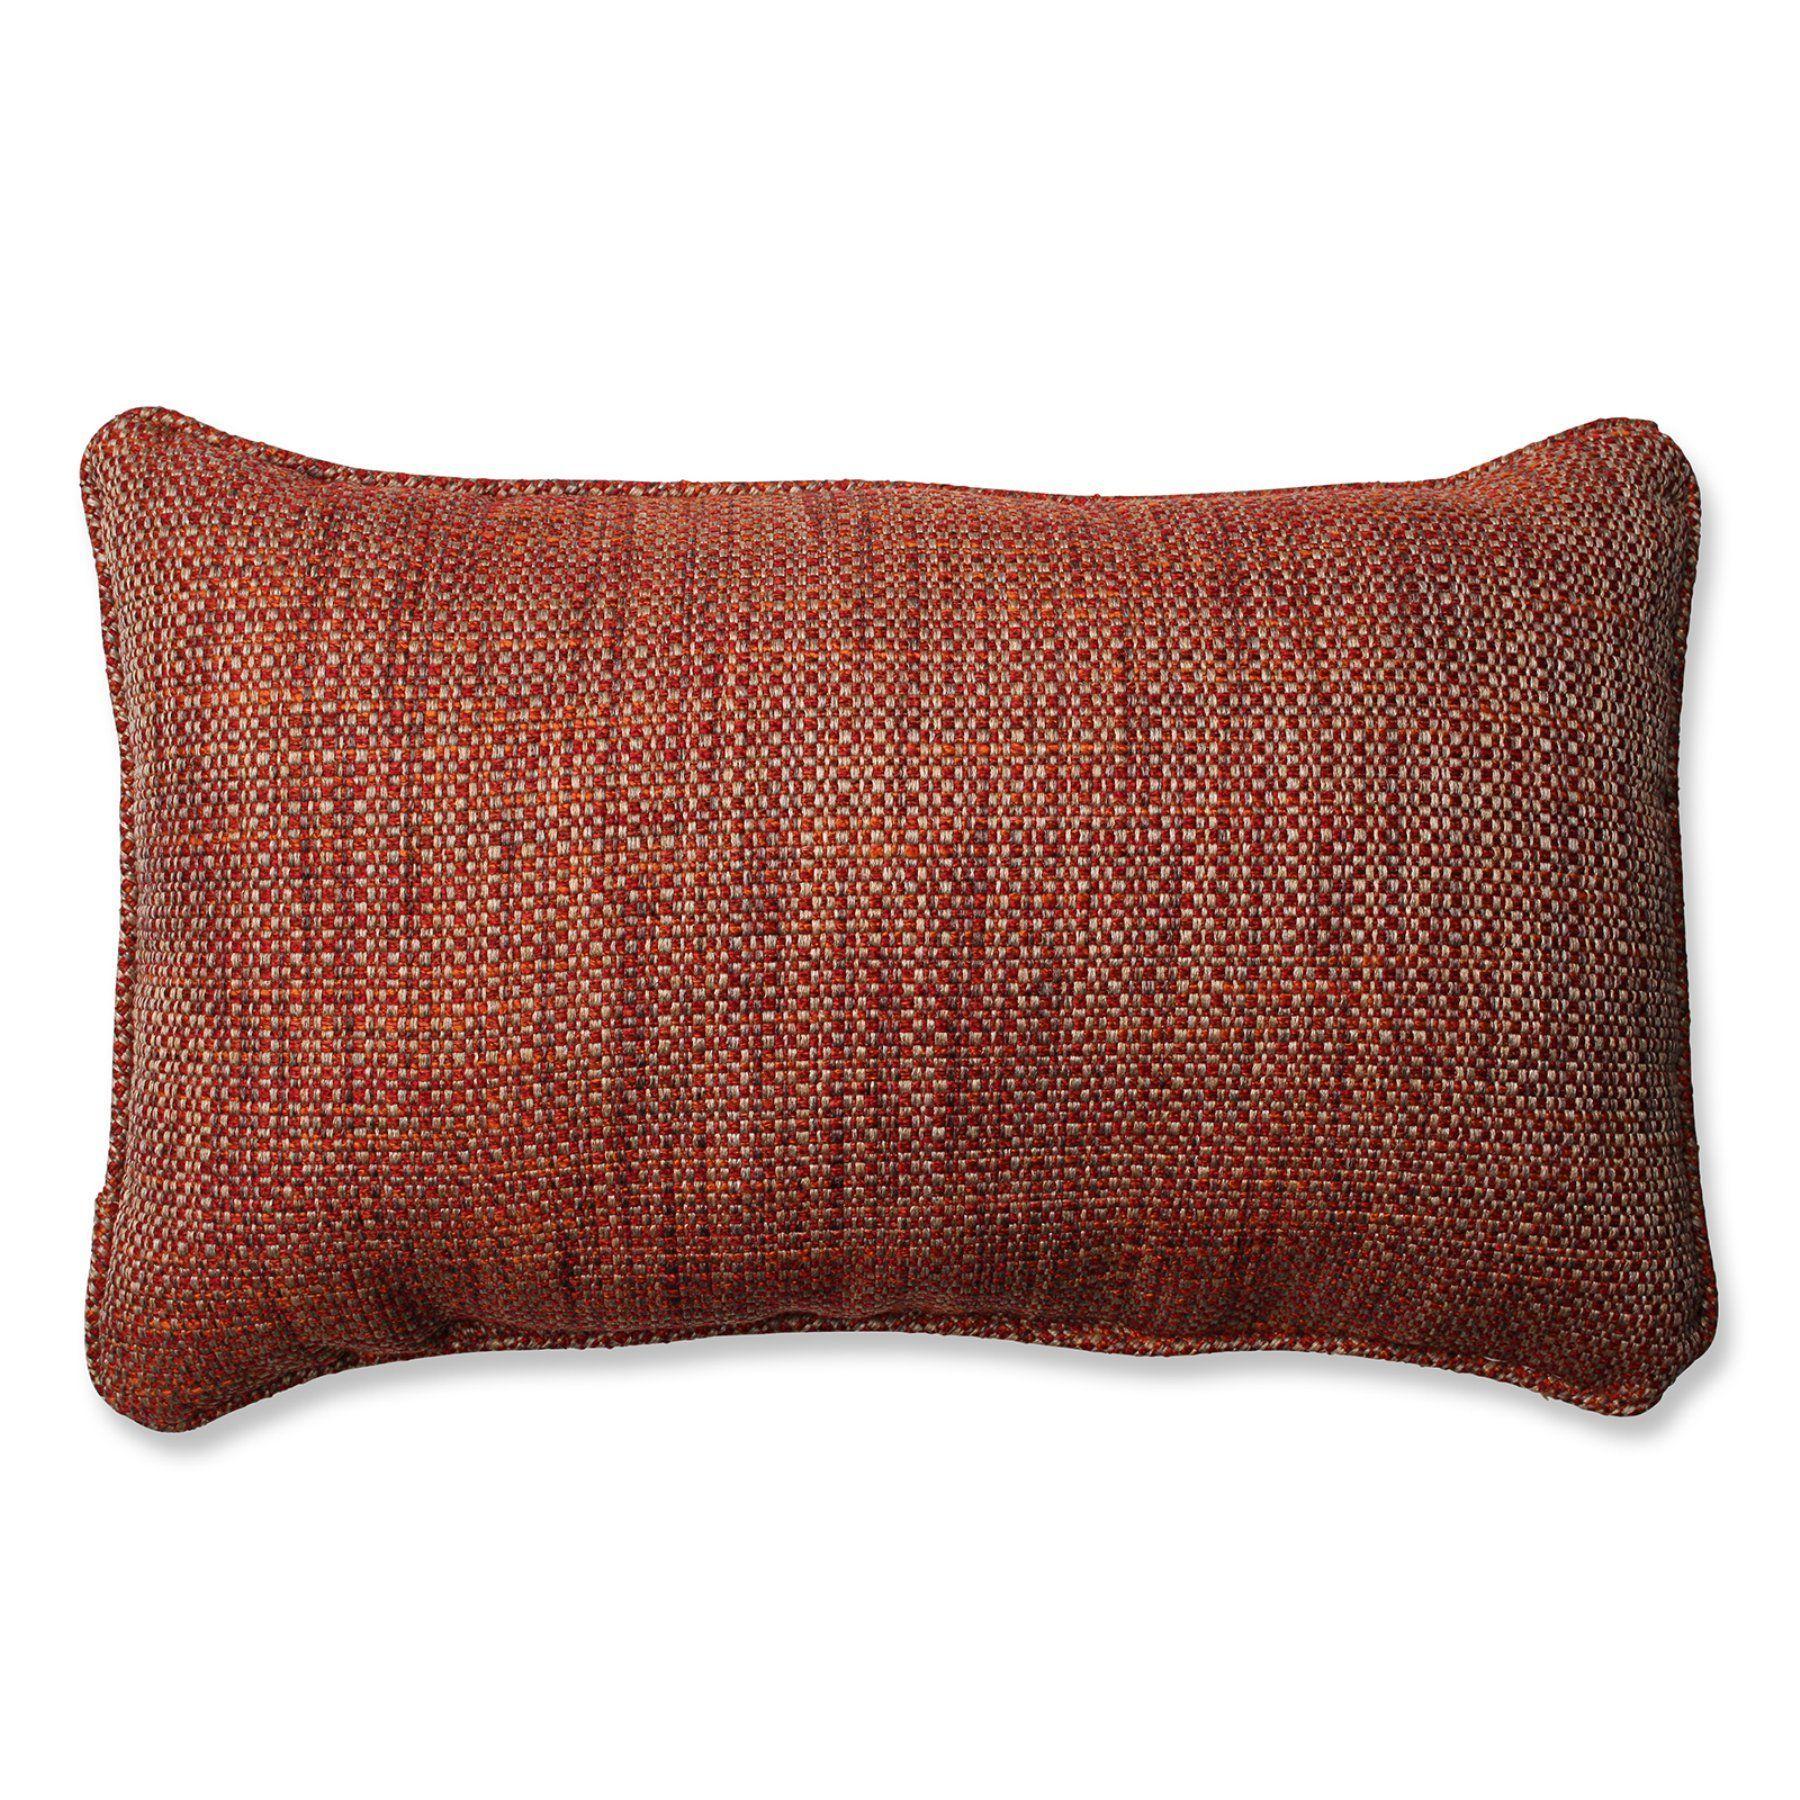 Miraculous Ideas Cheap Decorative Pillows Couch decorative pillows